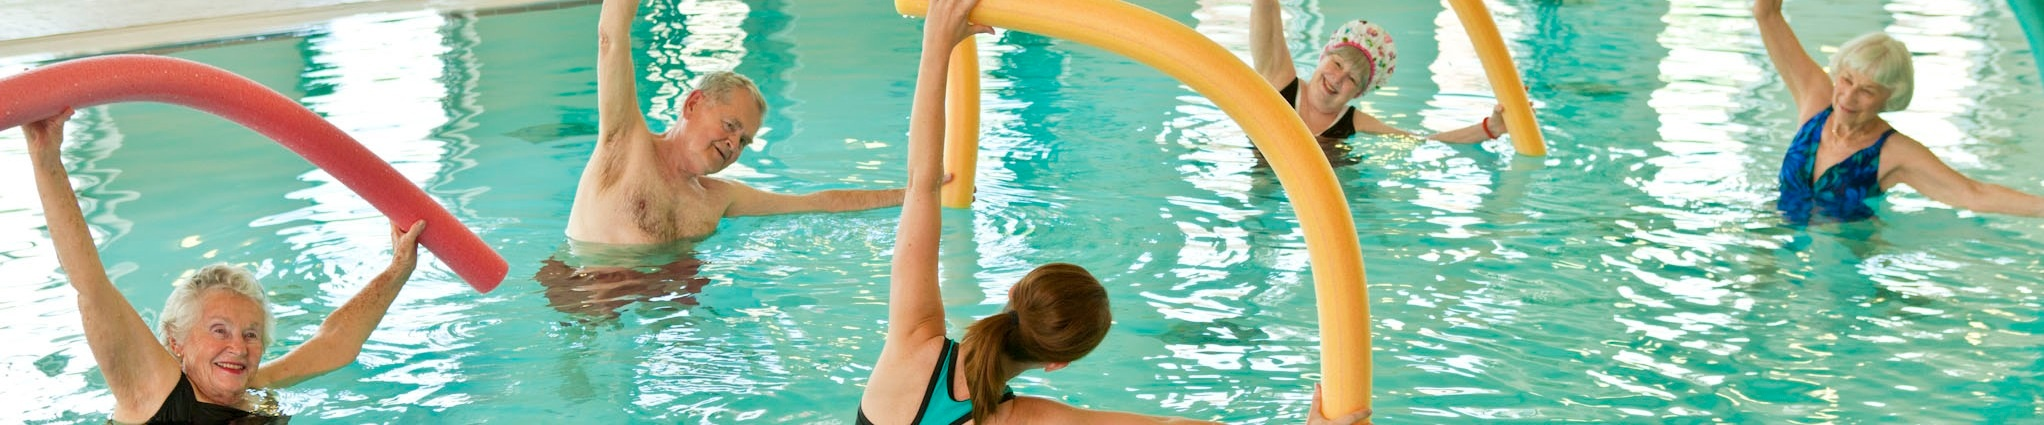 water aerobics for seniors